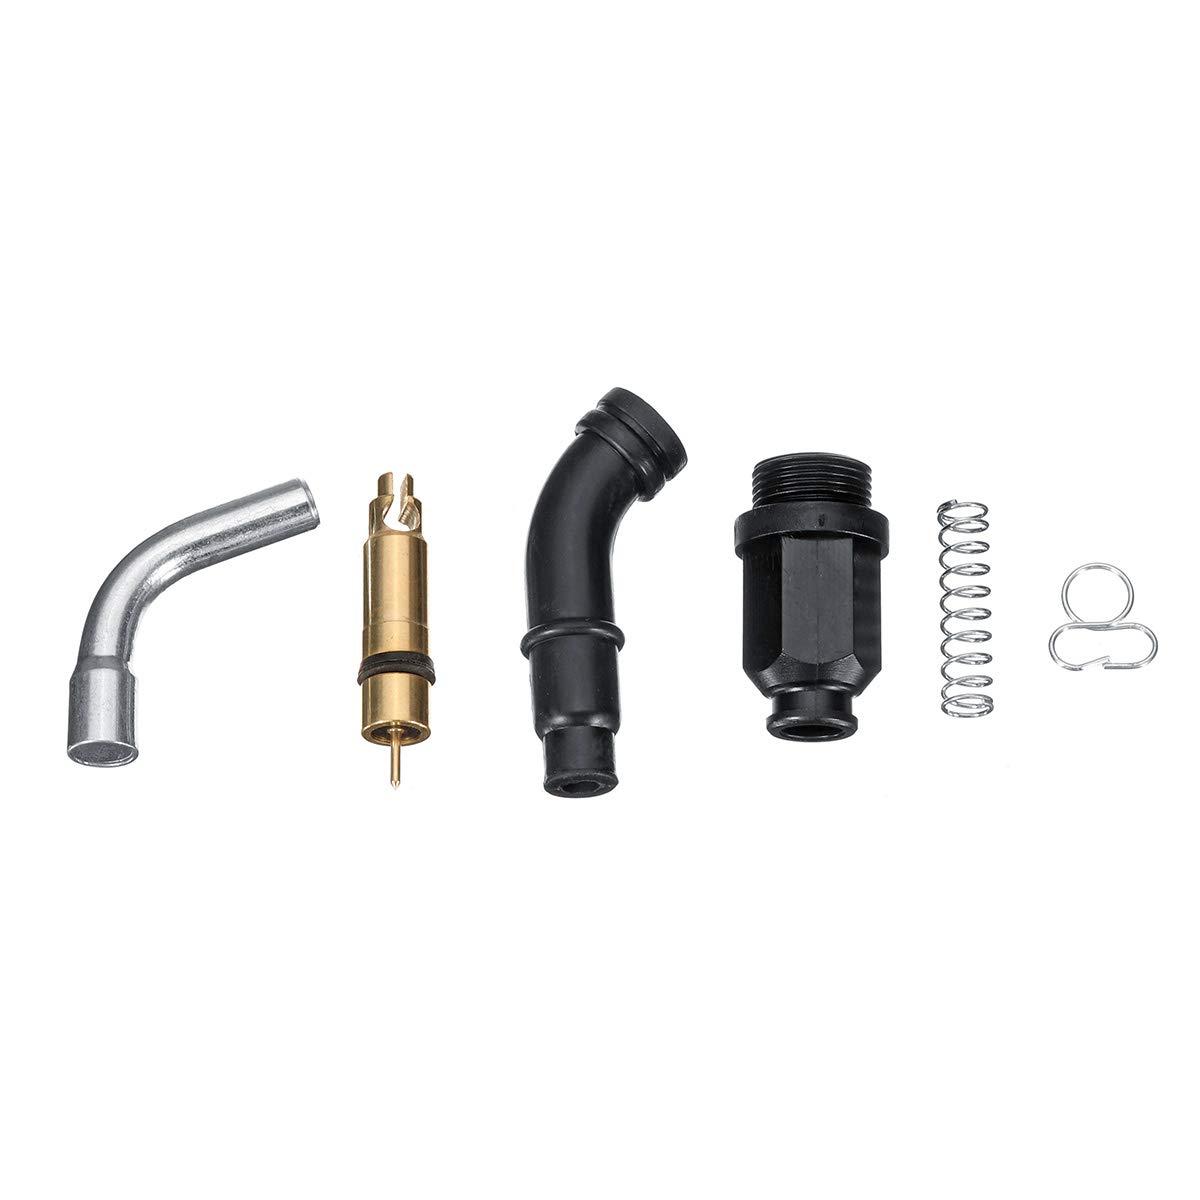 Forspero Carburador Choke Starter Kit De V/álvula para Honda TRX 300 Fourtrax 88-93